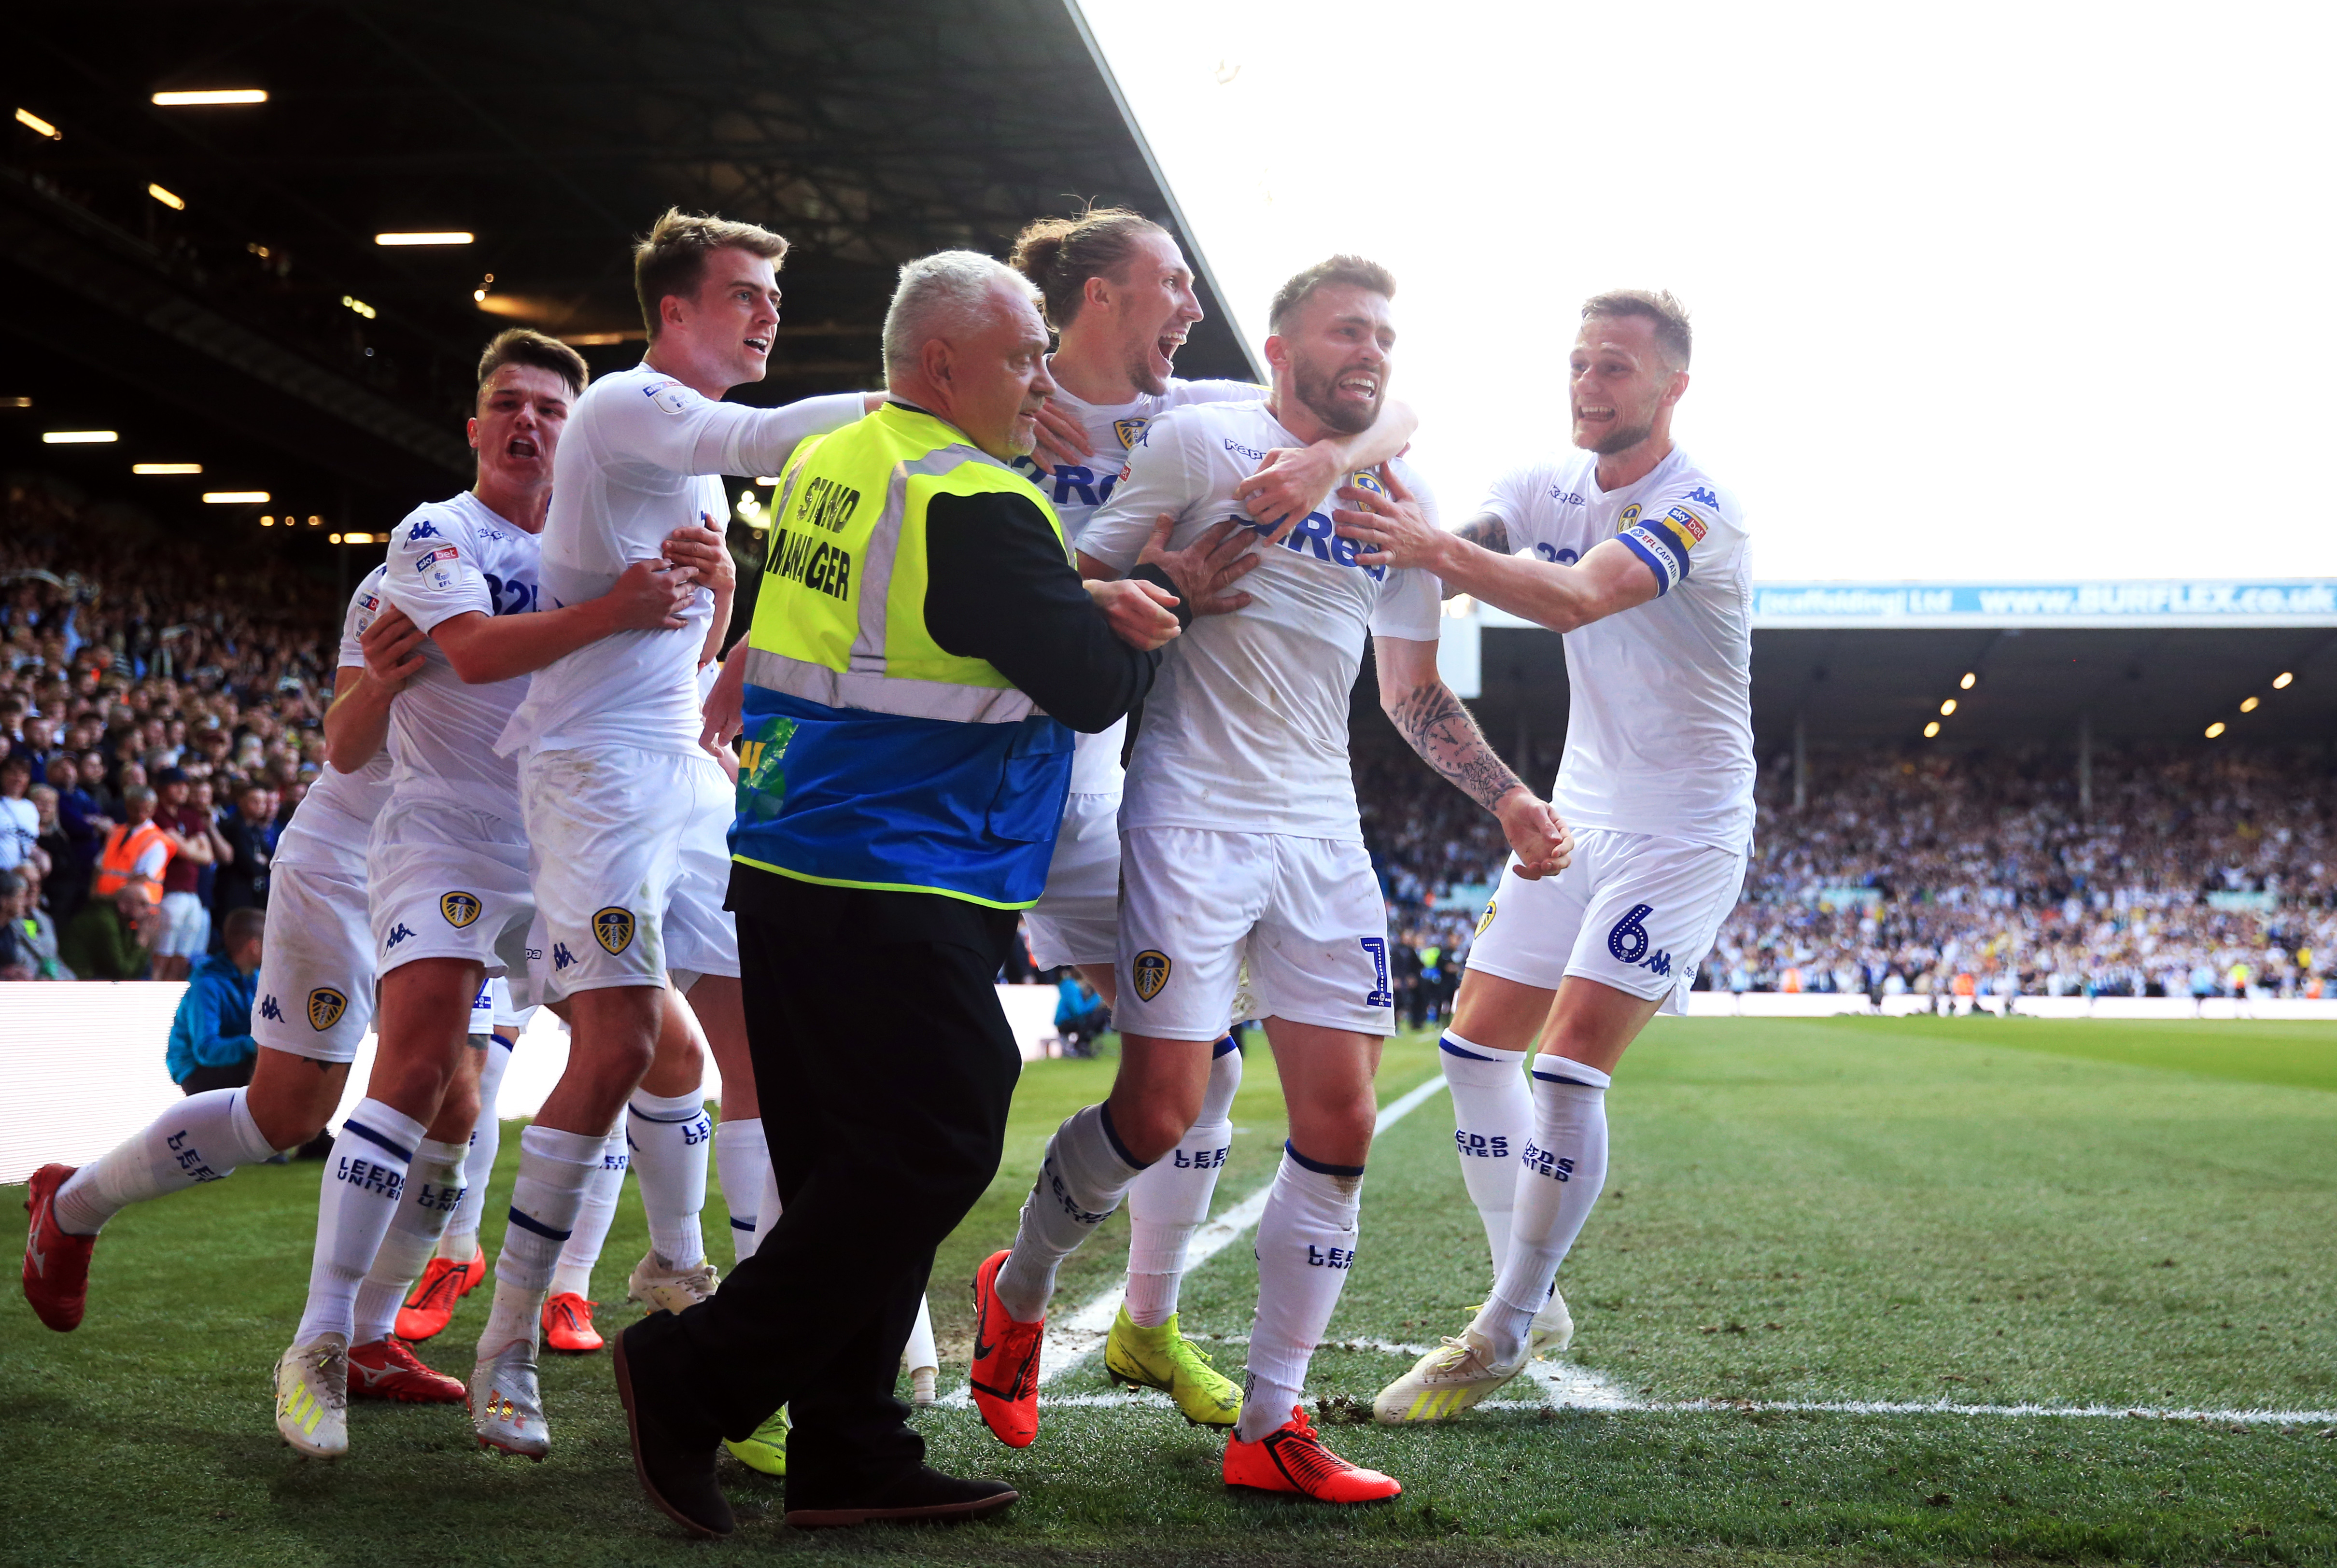 Leeds celebrate Stuart Dallas' goal. Image: PA Images